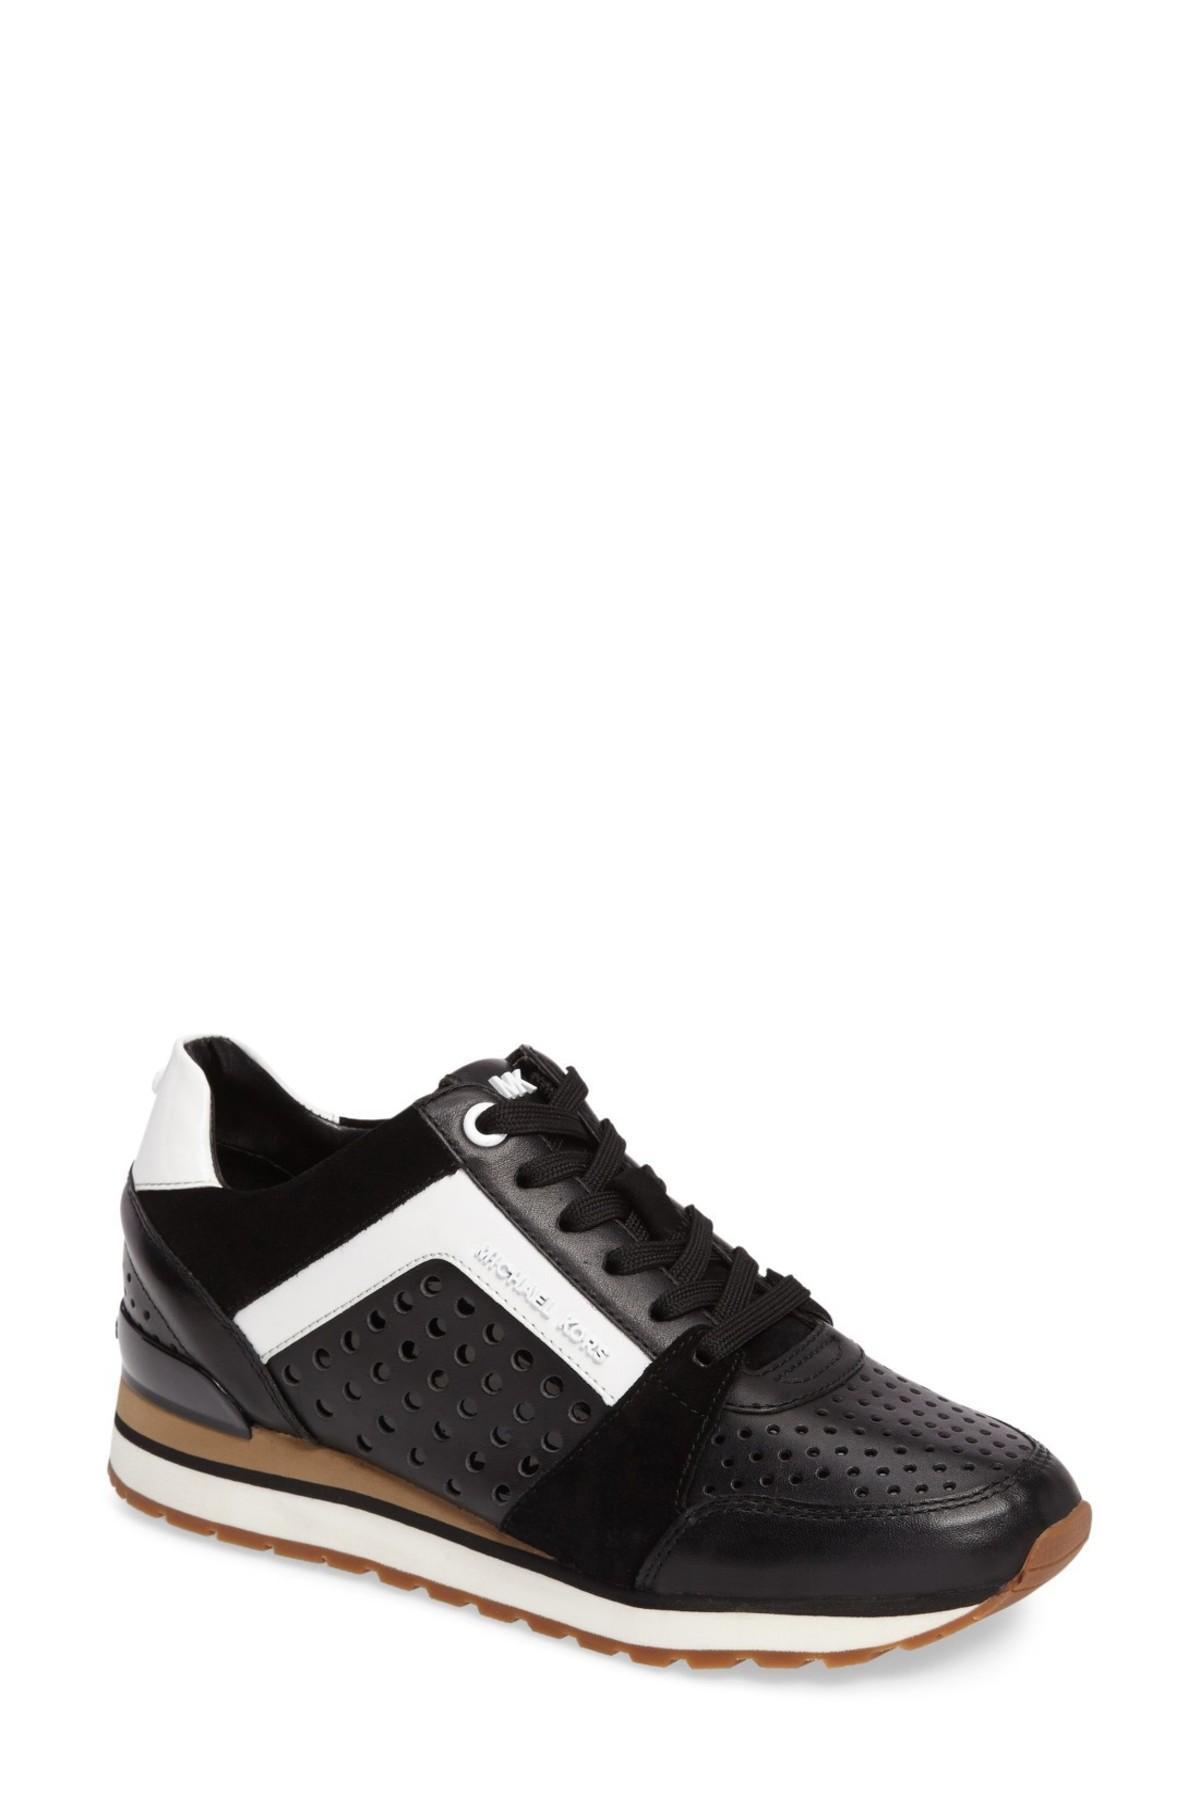 Barneys Warehouse Shoes Women